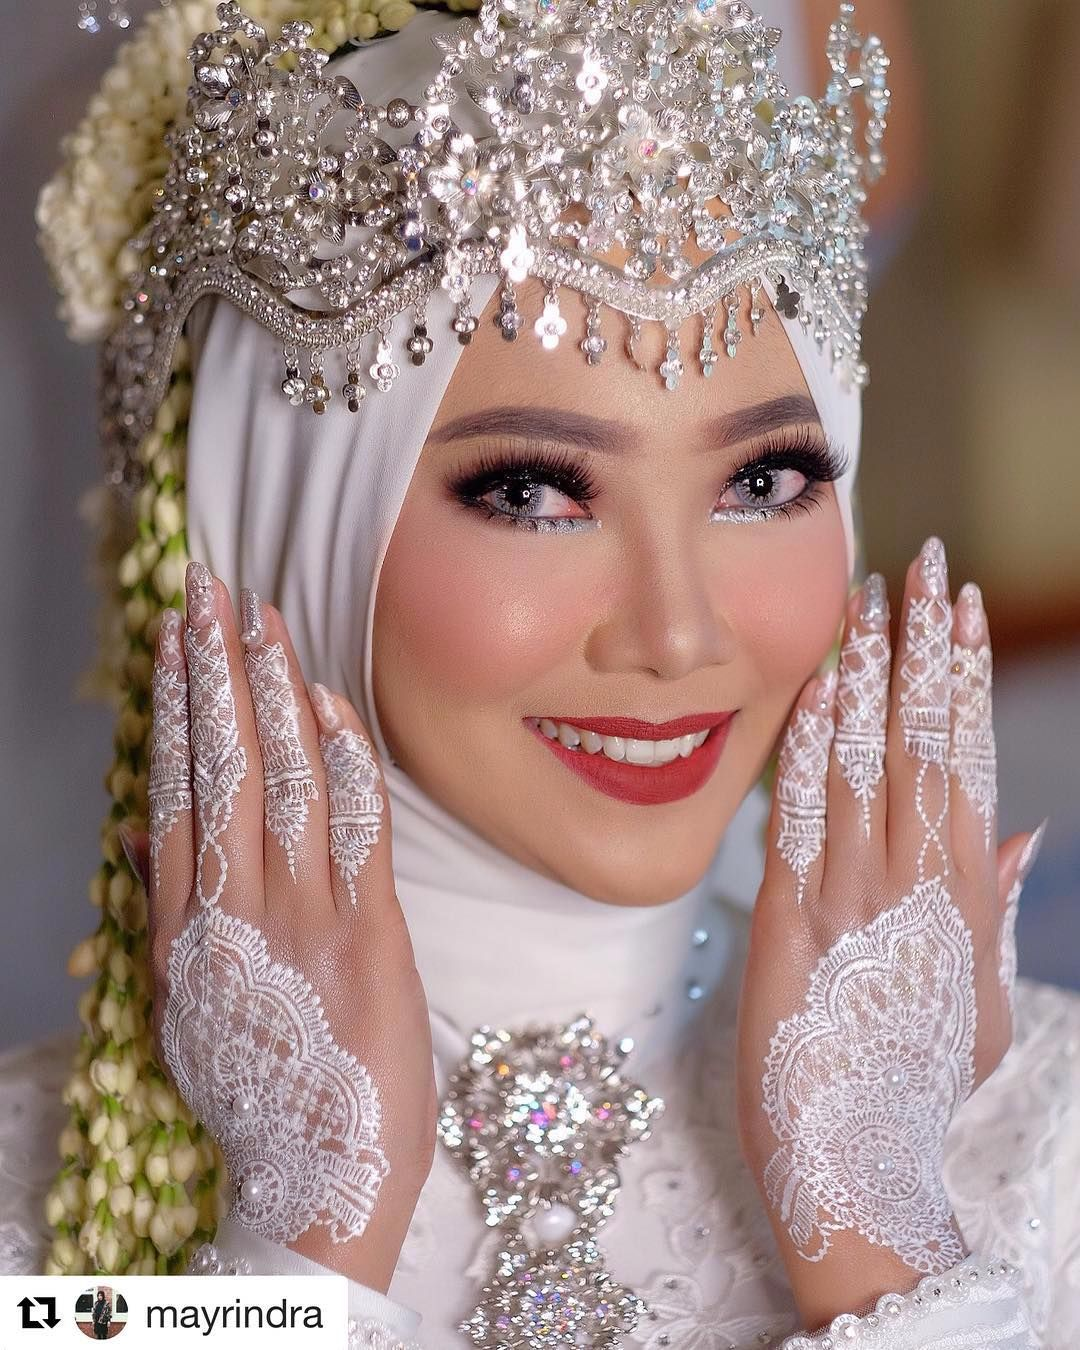 Repost Mayrindra With Get Repost Akad Nikah Mba Siskahelen Sunda Siger Make Up By Me Hijab Siger By Lina He Kerudung Pengantin Pengantin Berhijab Pengantin